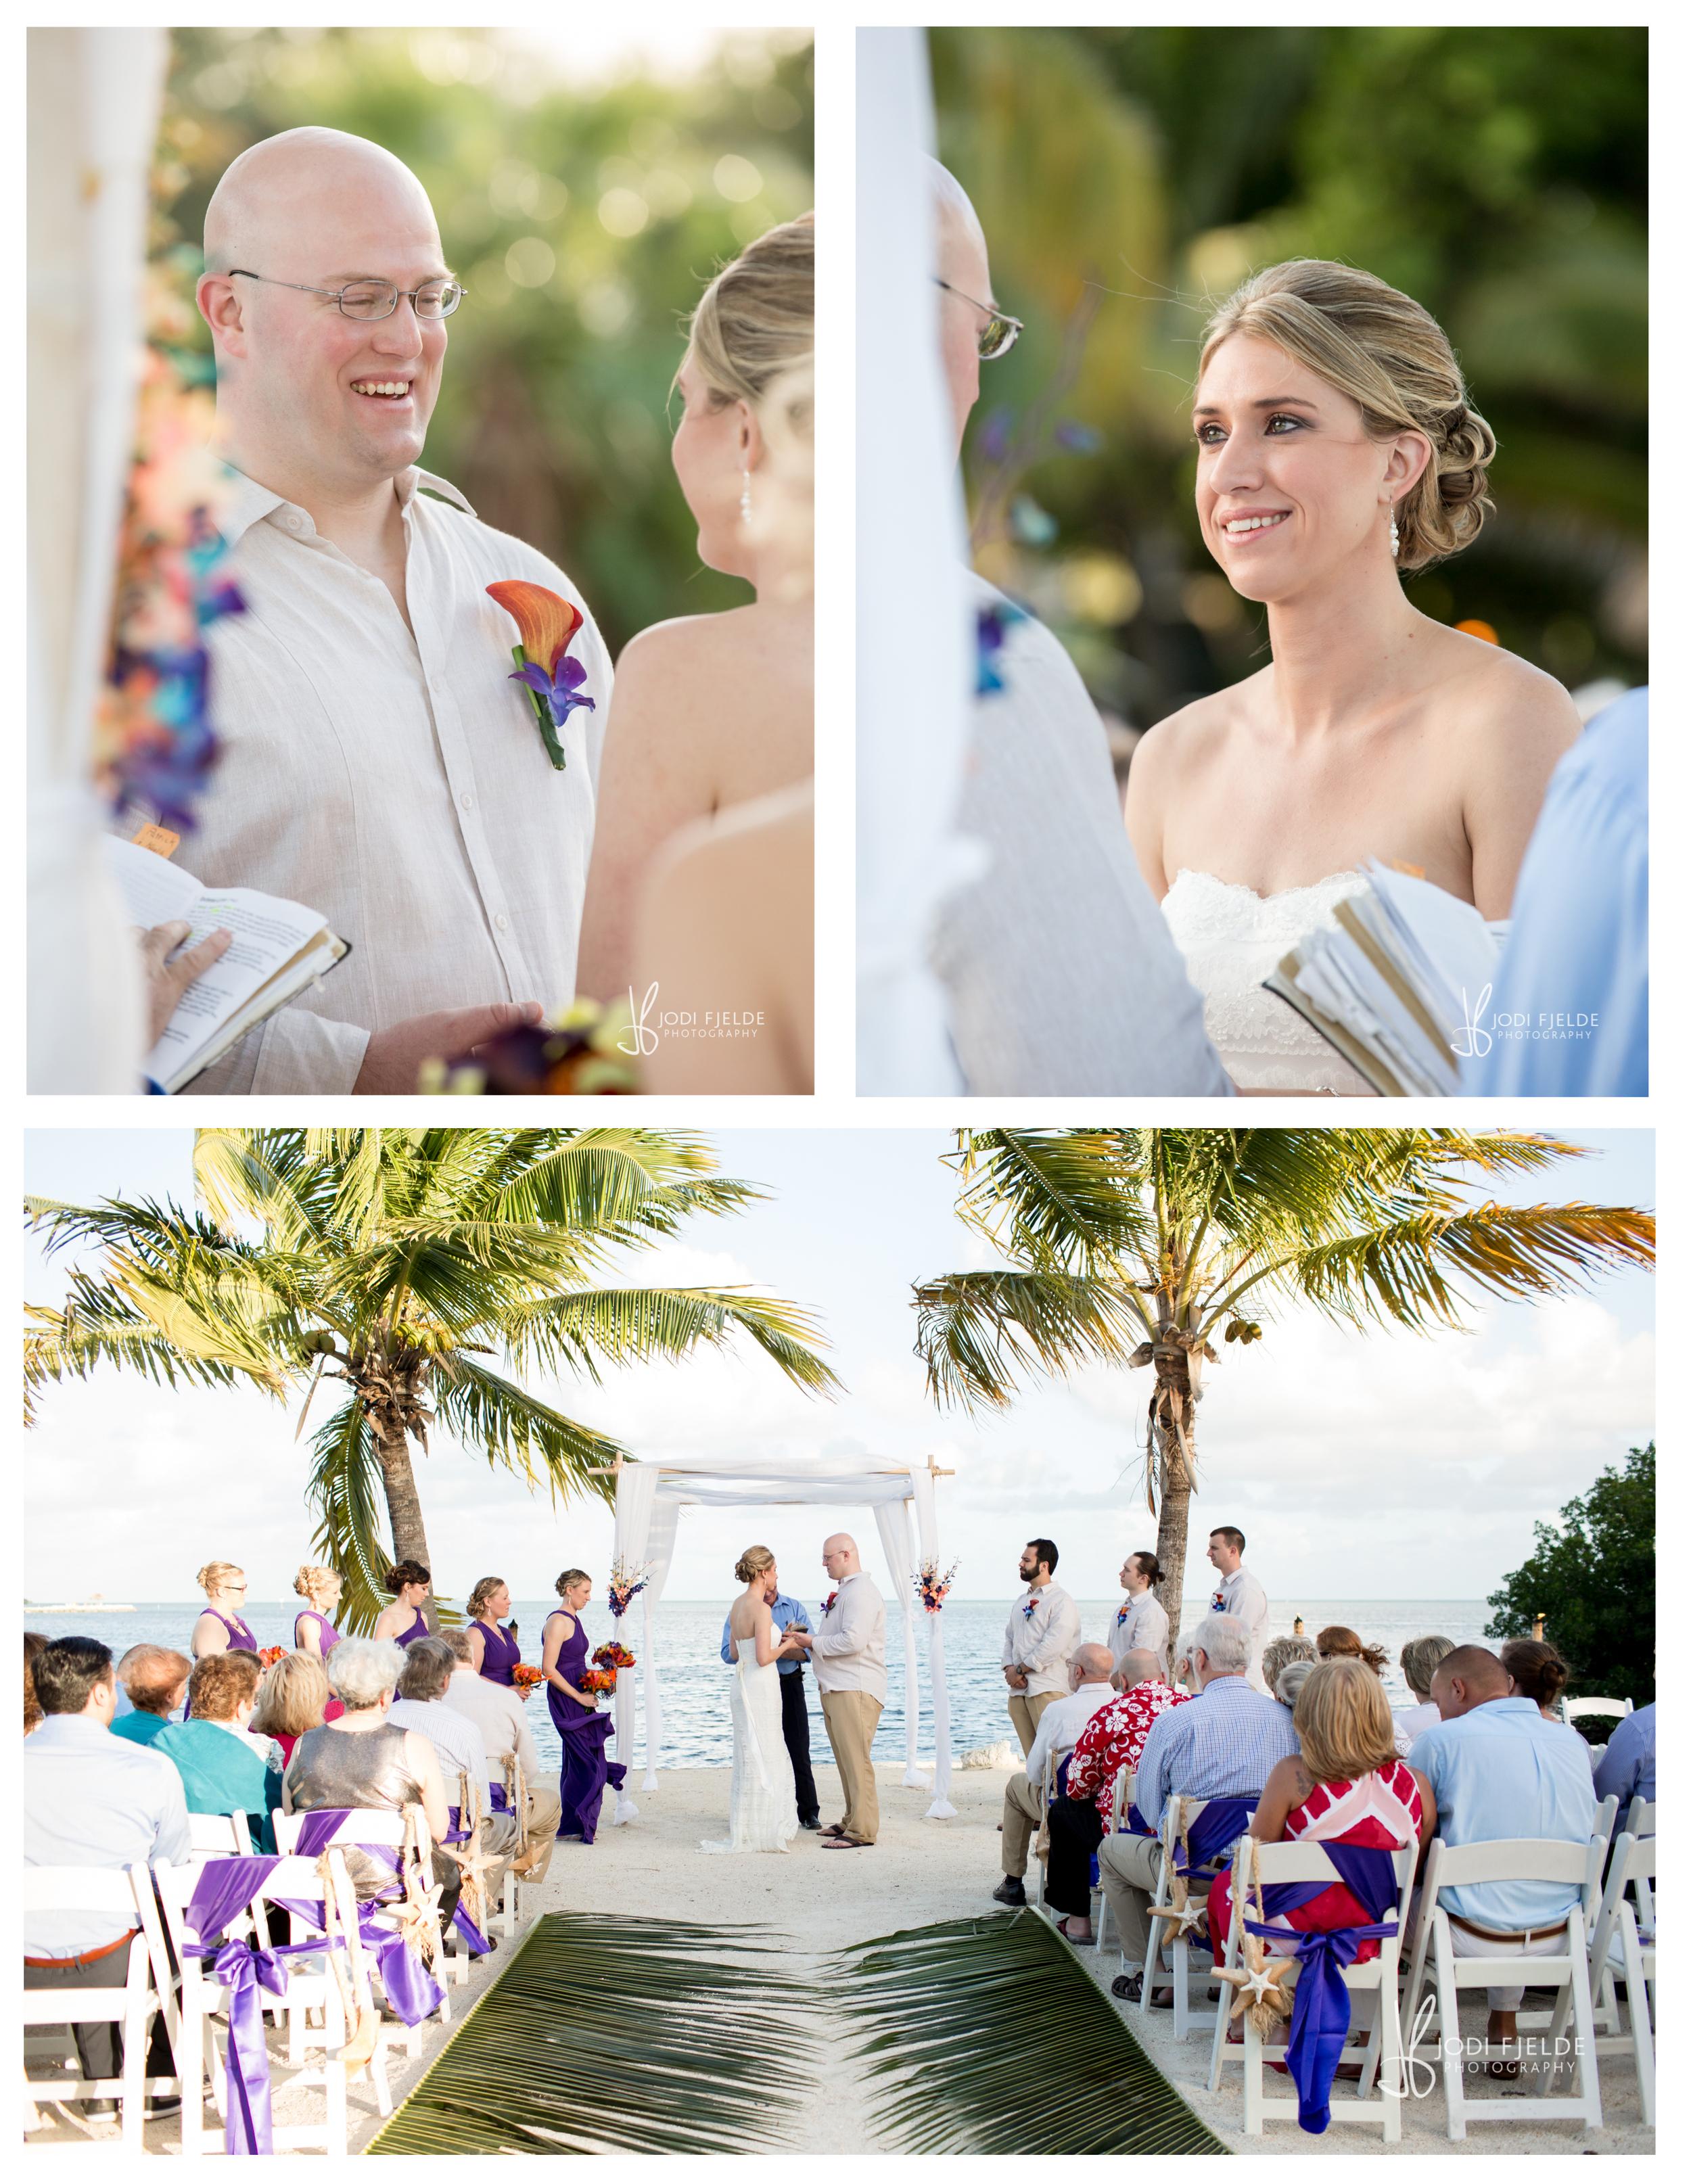 Cocconut_Cove_&_ Marina_ wedding_Kayla_and_Patrick 19.jpg